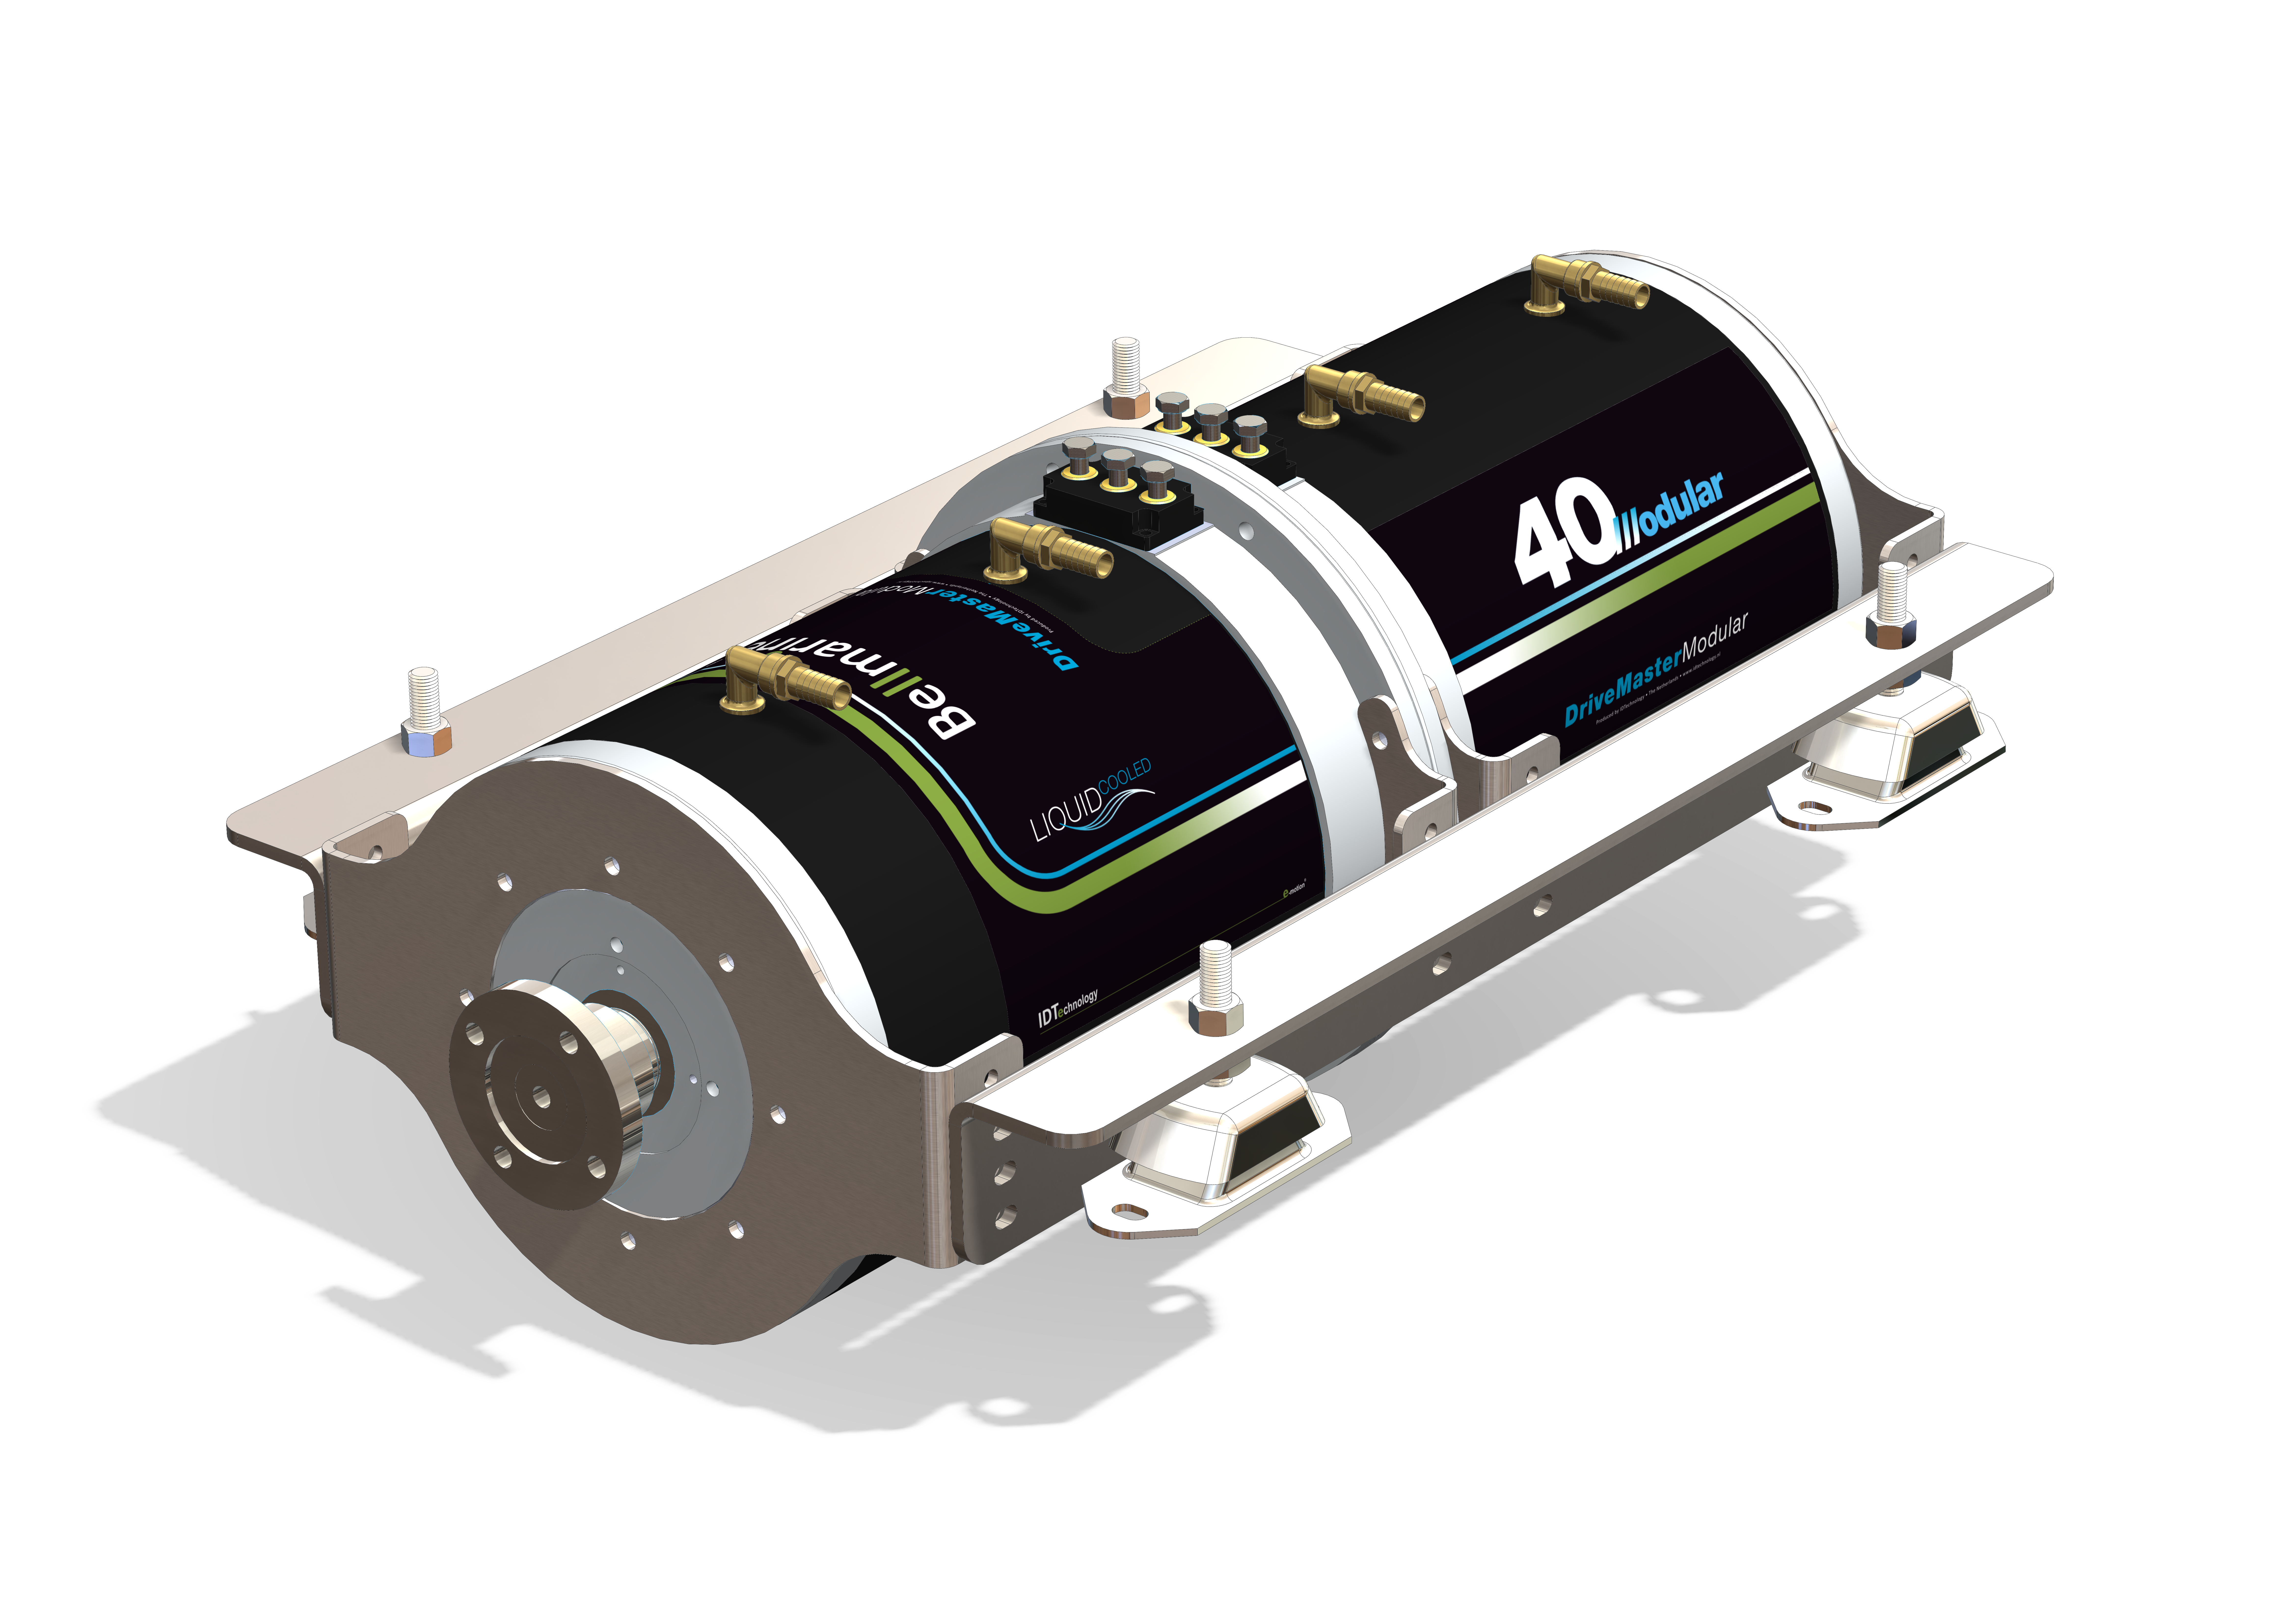 Bellmarine Drivemaster Modular Electric Inboard Eco